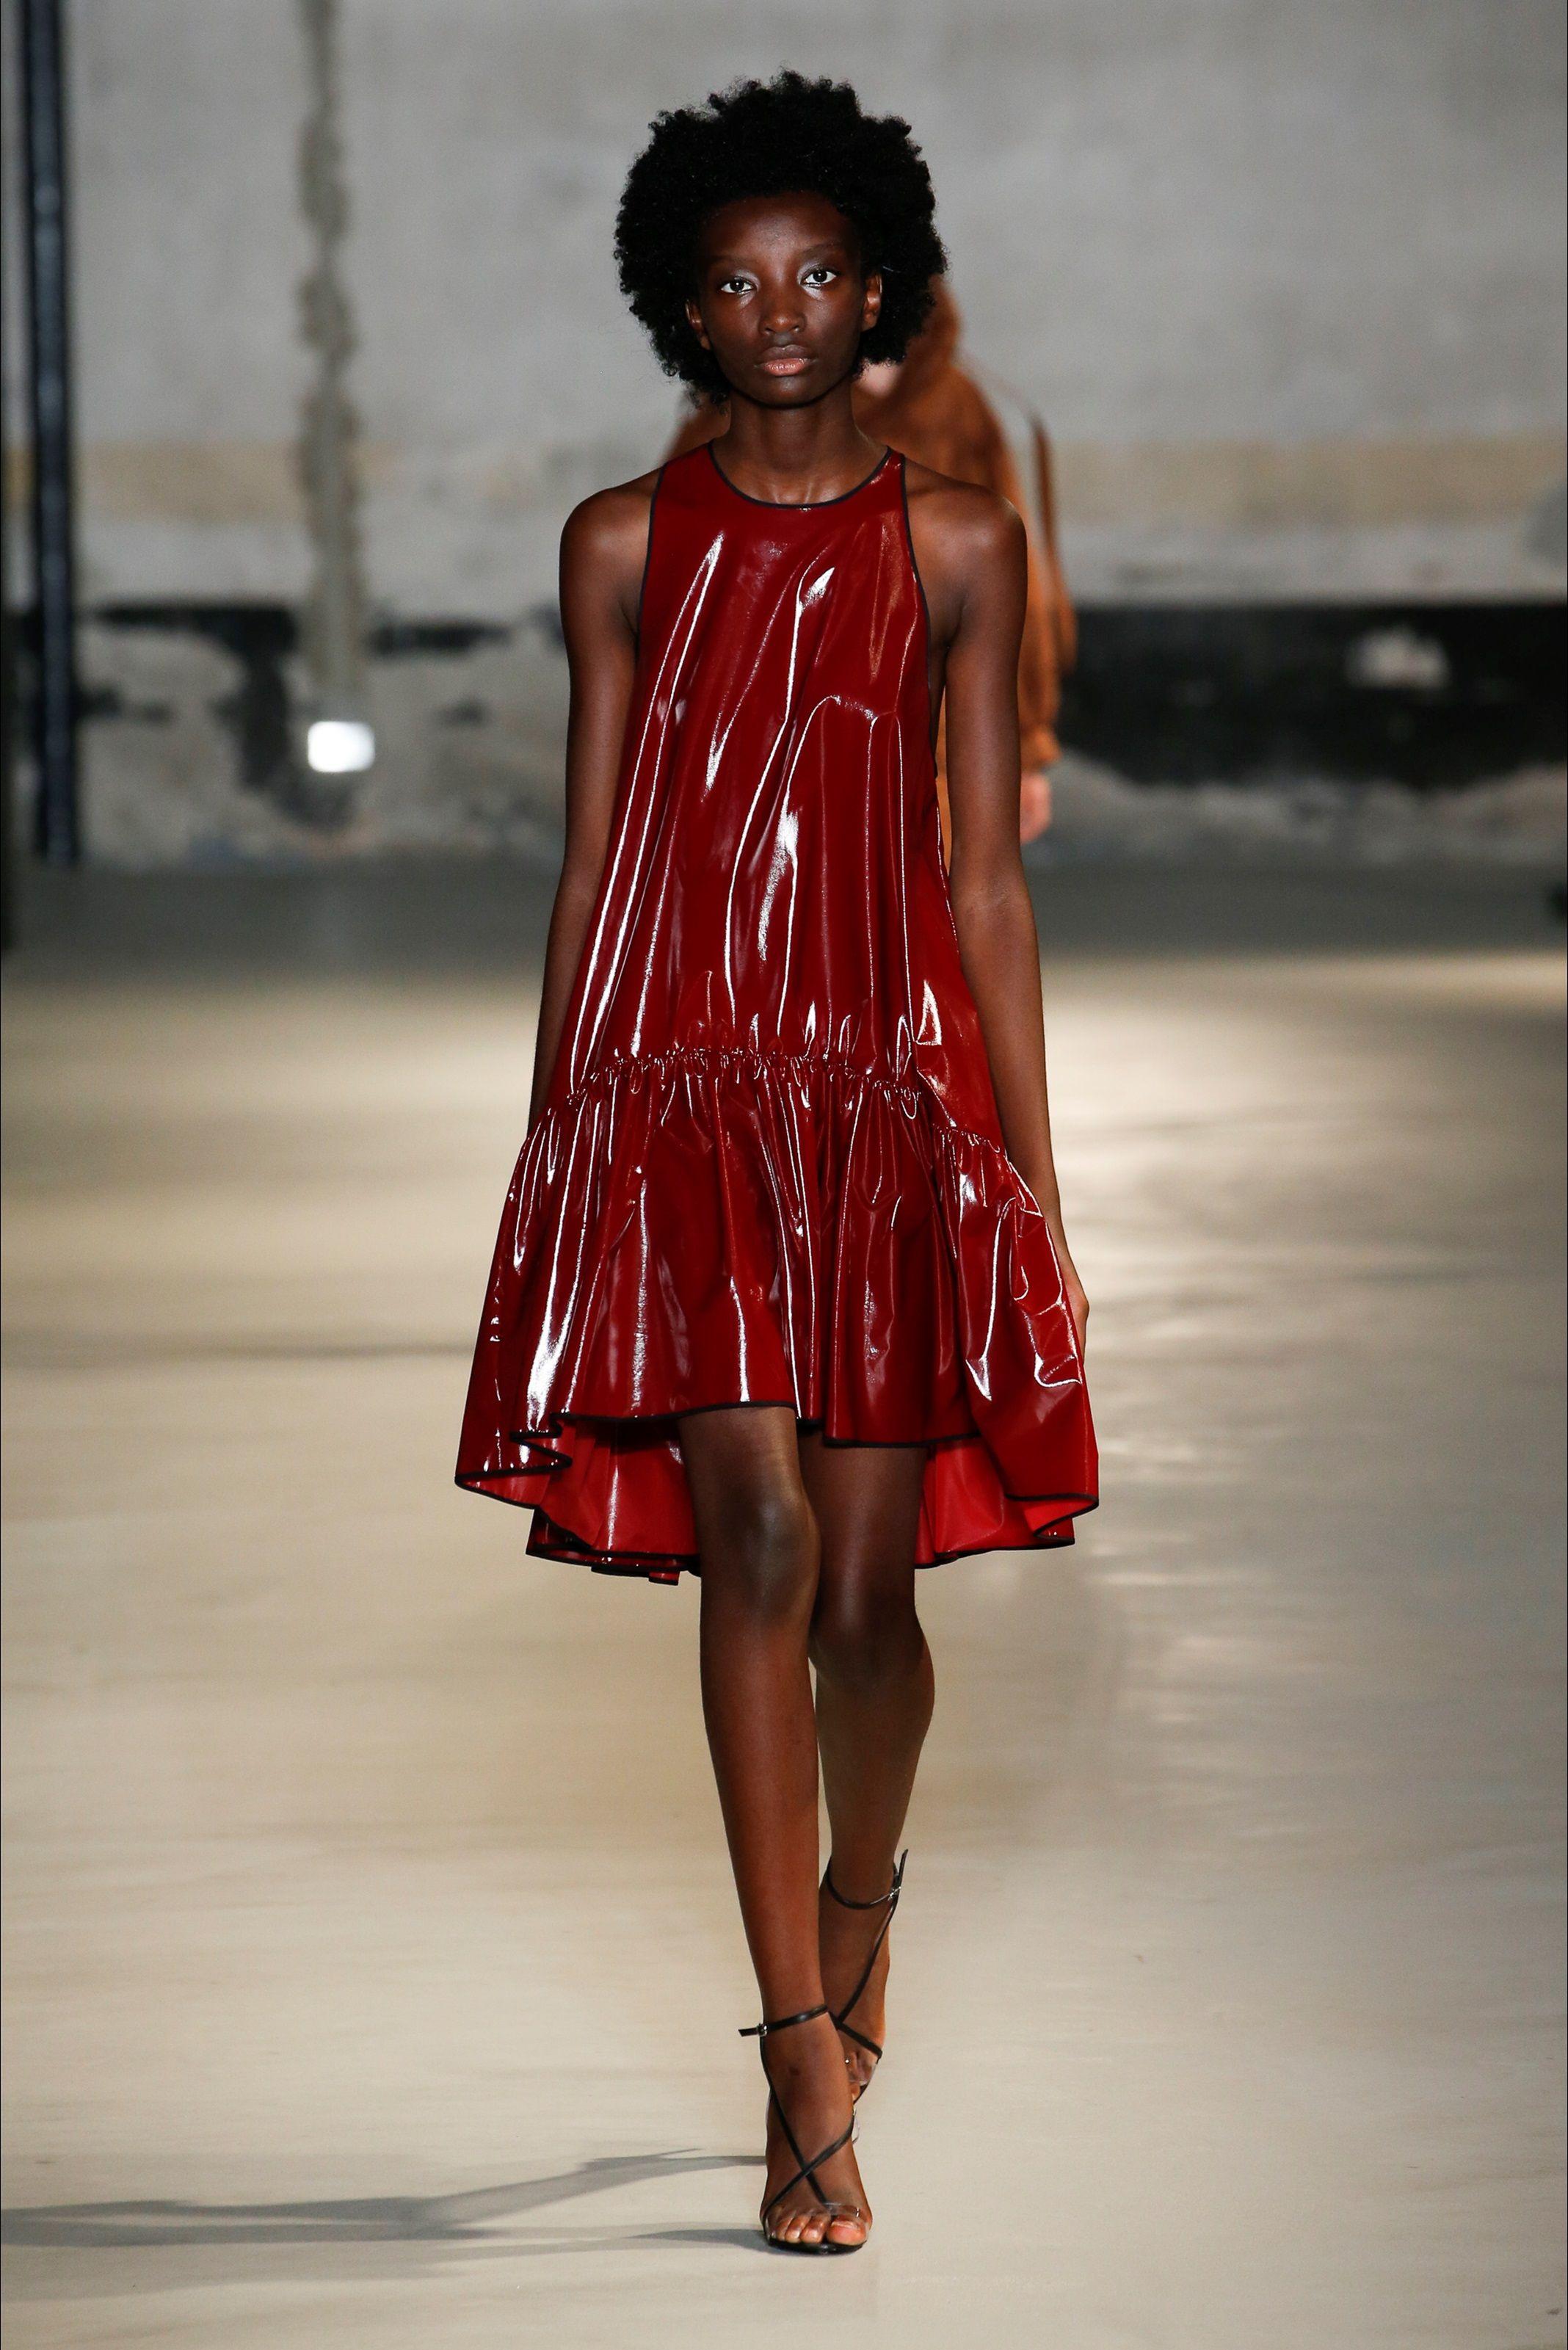 55efe0afe5 Sfilata N°21 Milano - Collezioni Primavera Estate 2019 - Vogue | On ...